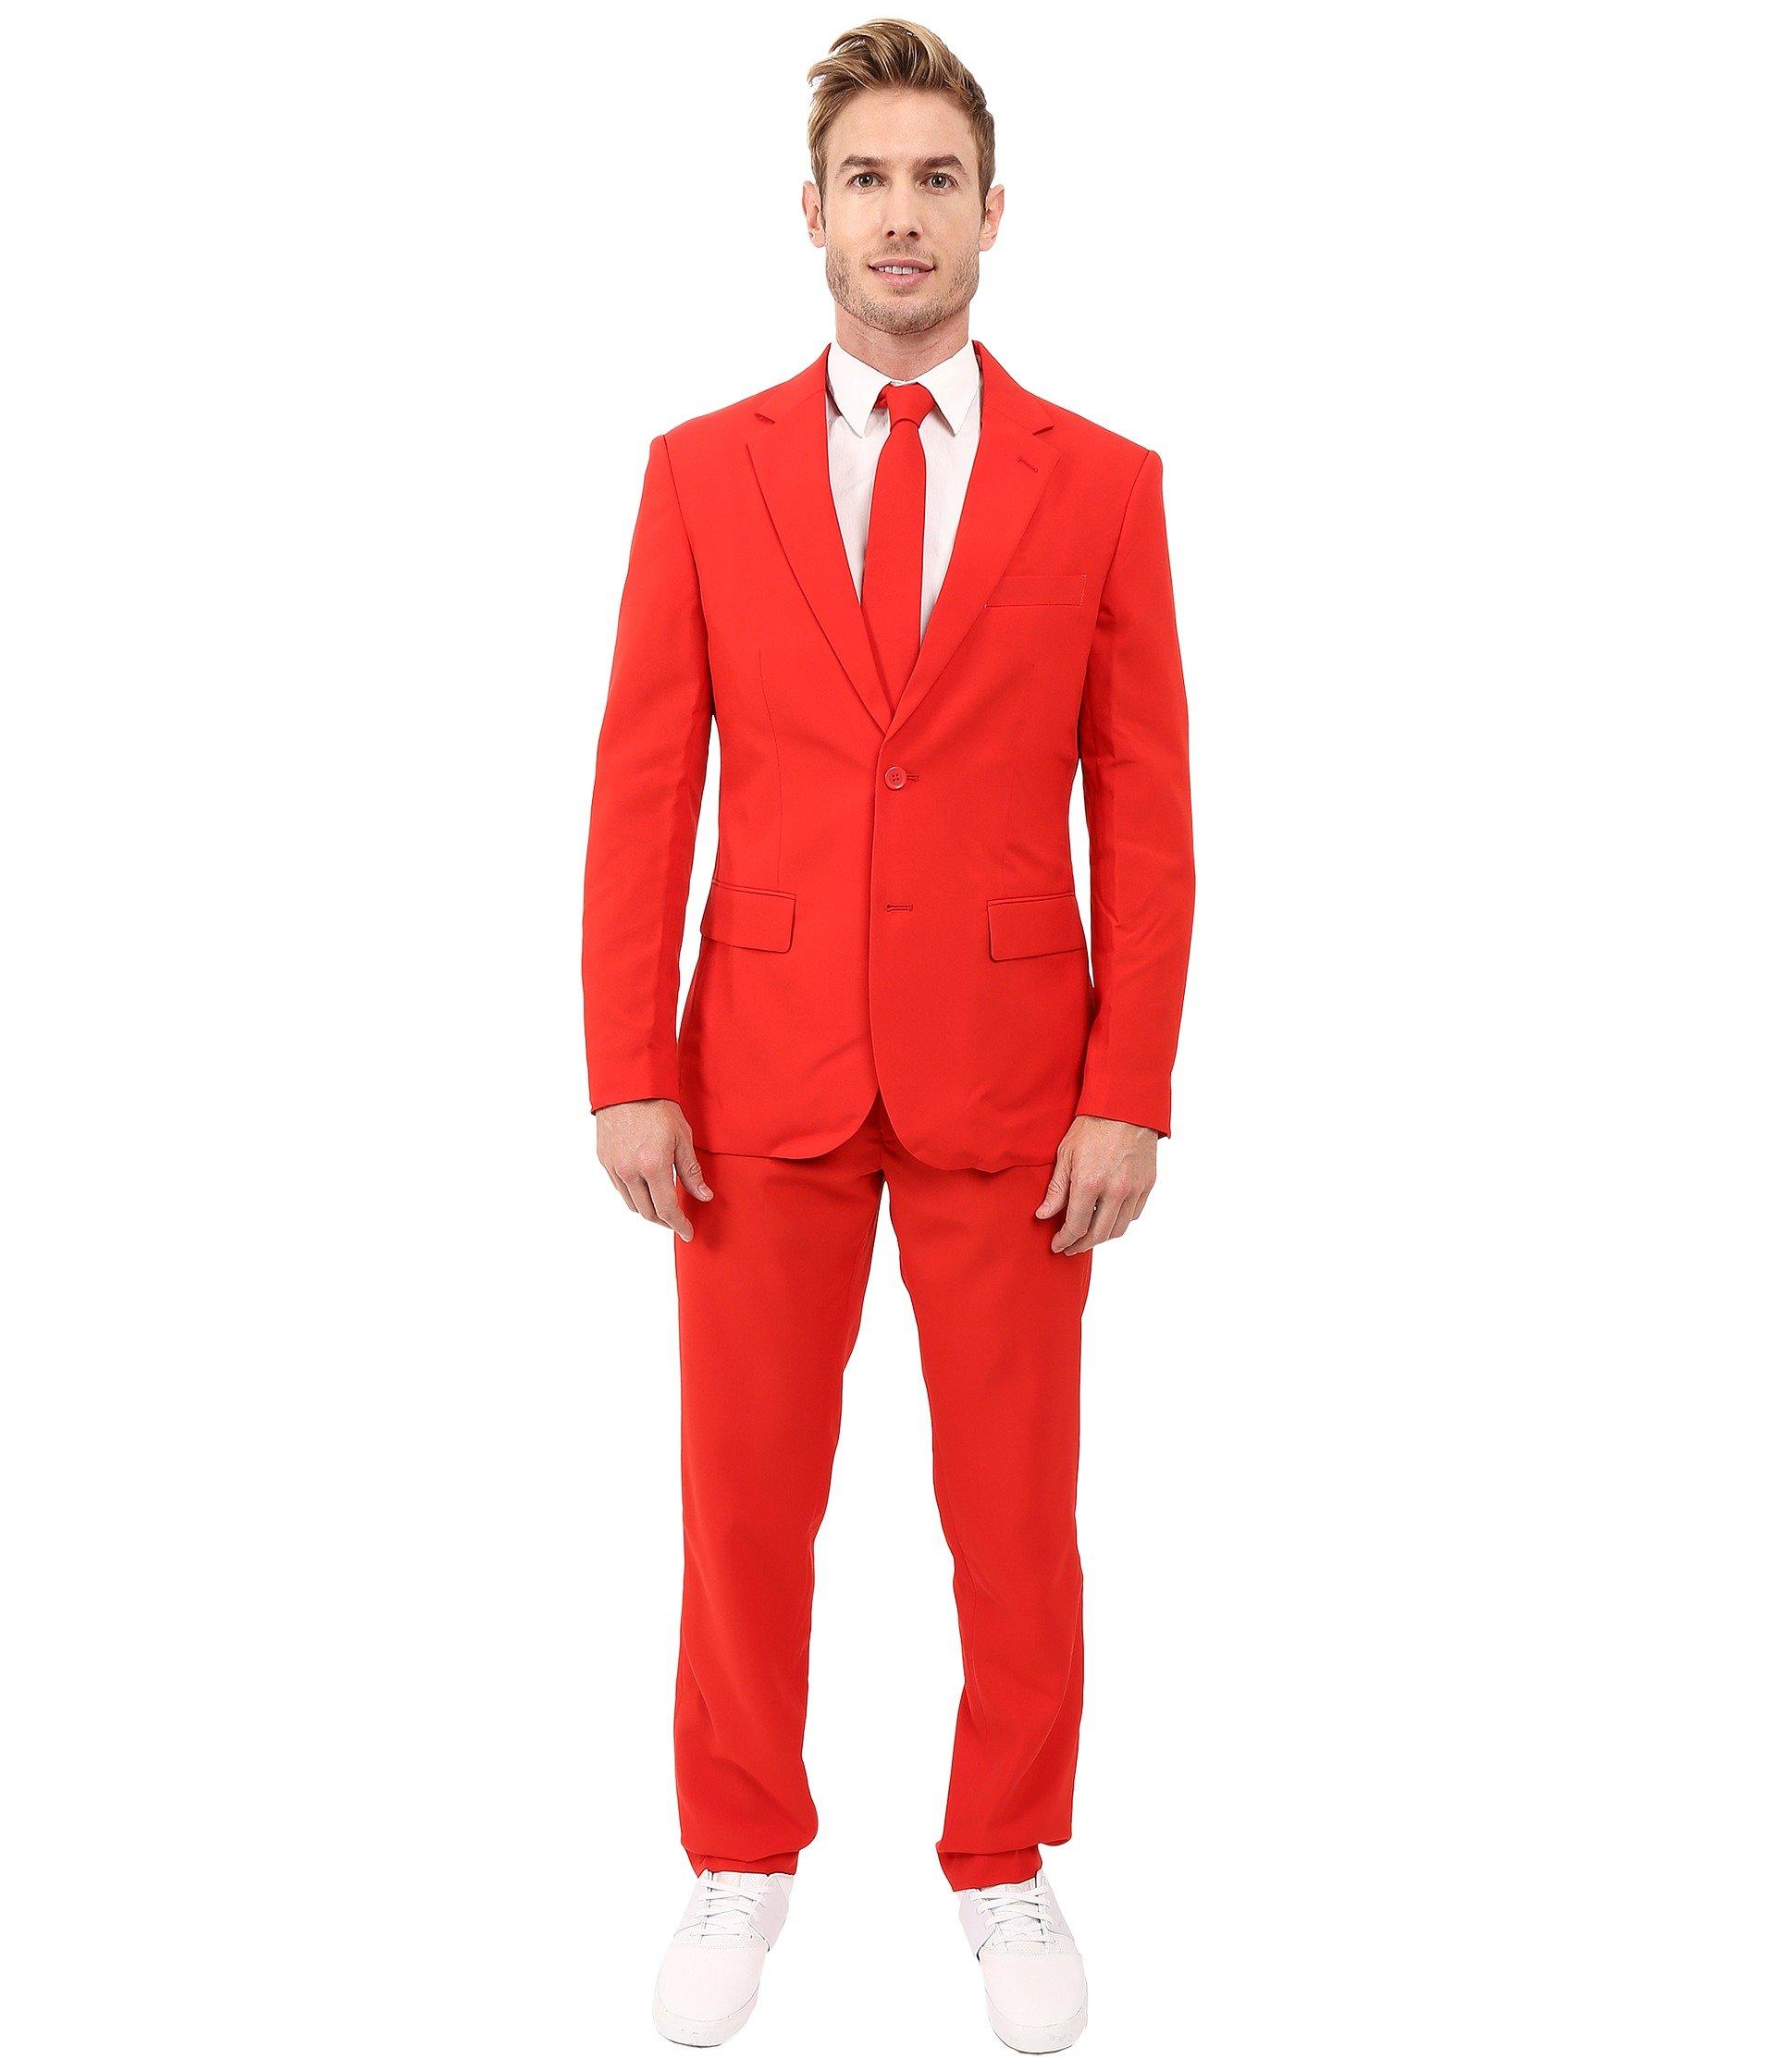 Vestido para Hombre OppoSuits Red Devil Suit  + OppoSuits en VeoyCompro.net